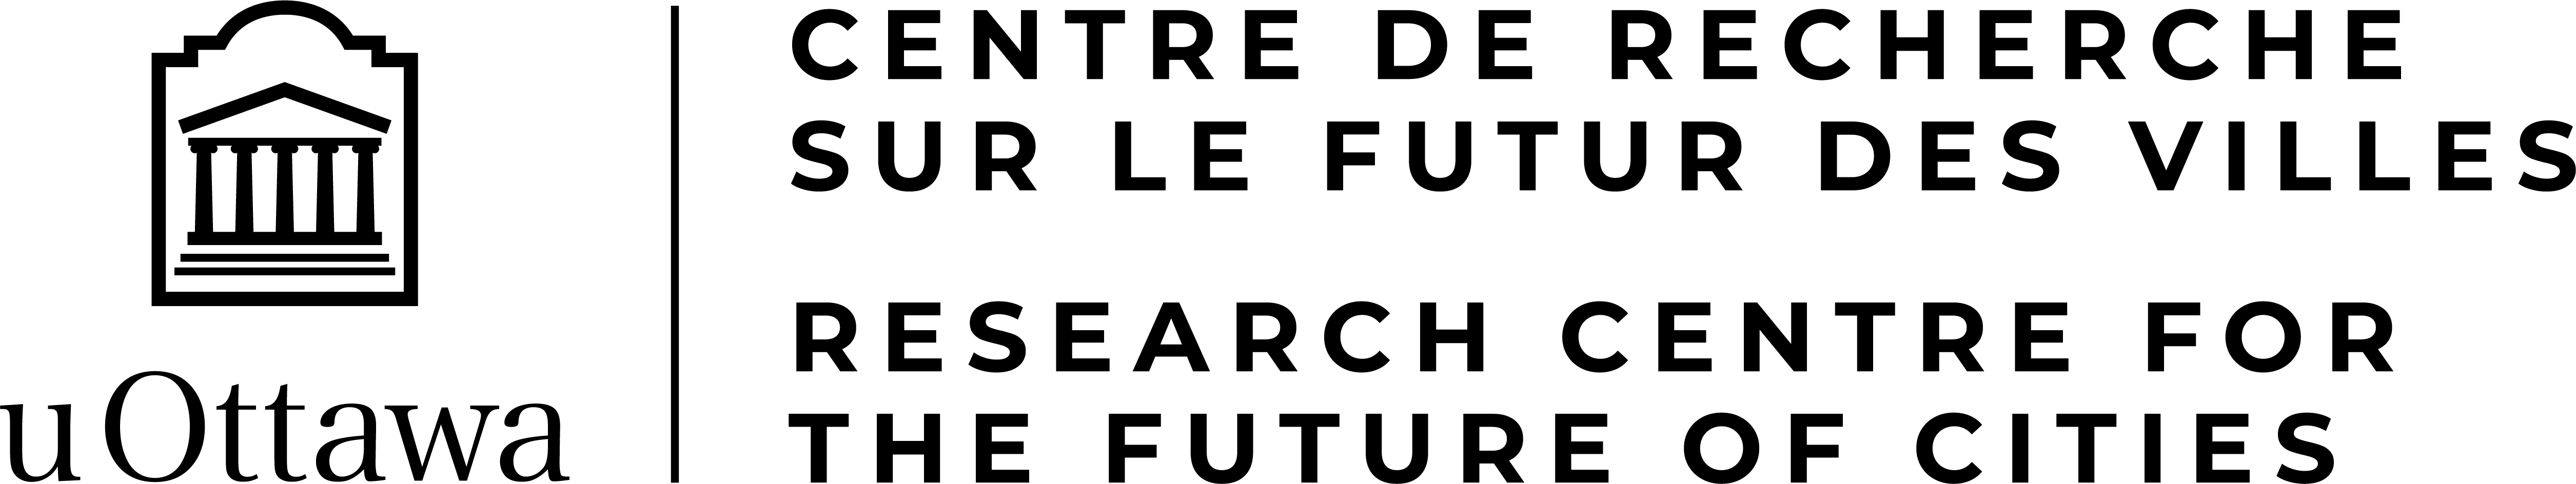 Centre's logo